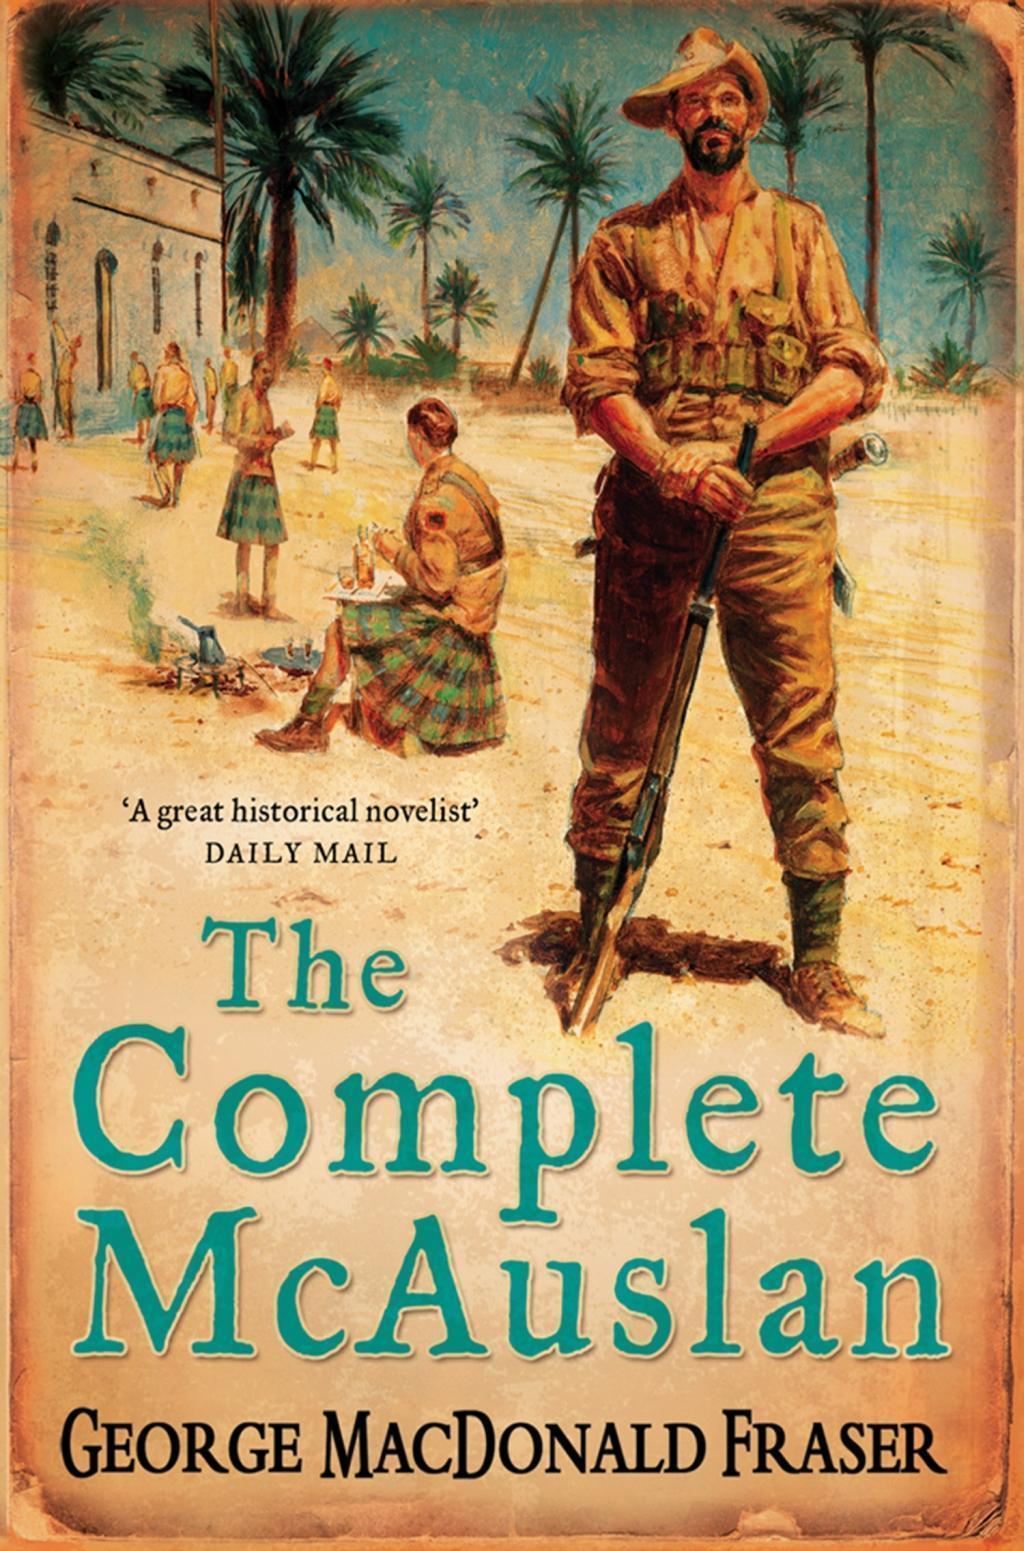 The Complete McAuslan